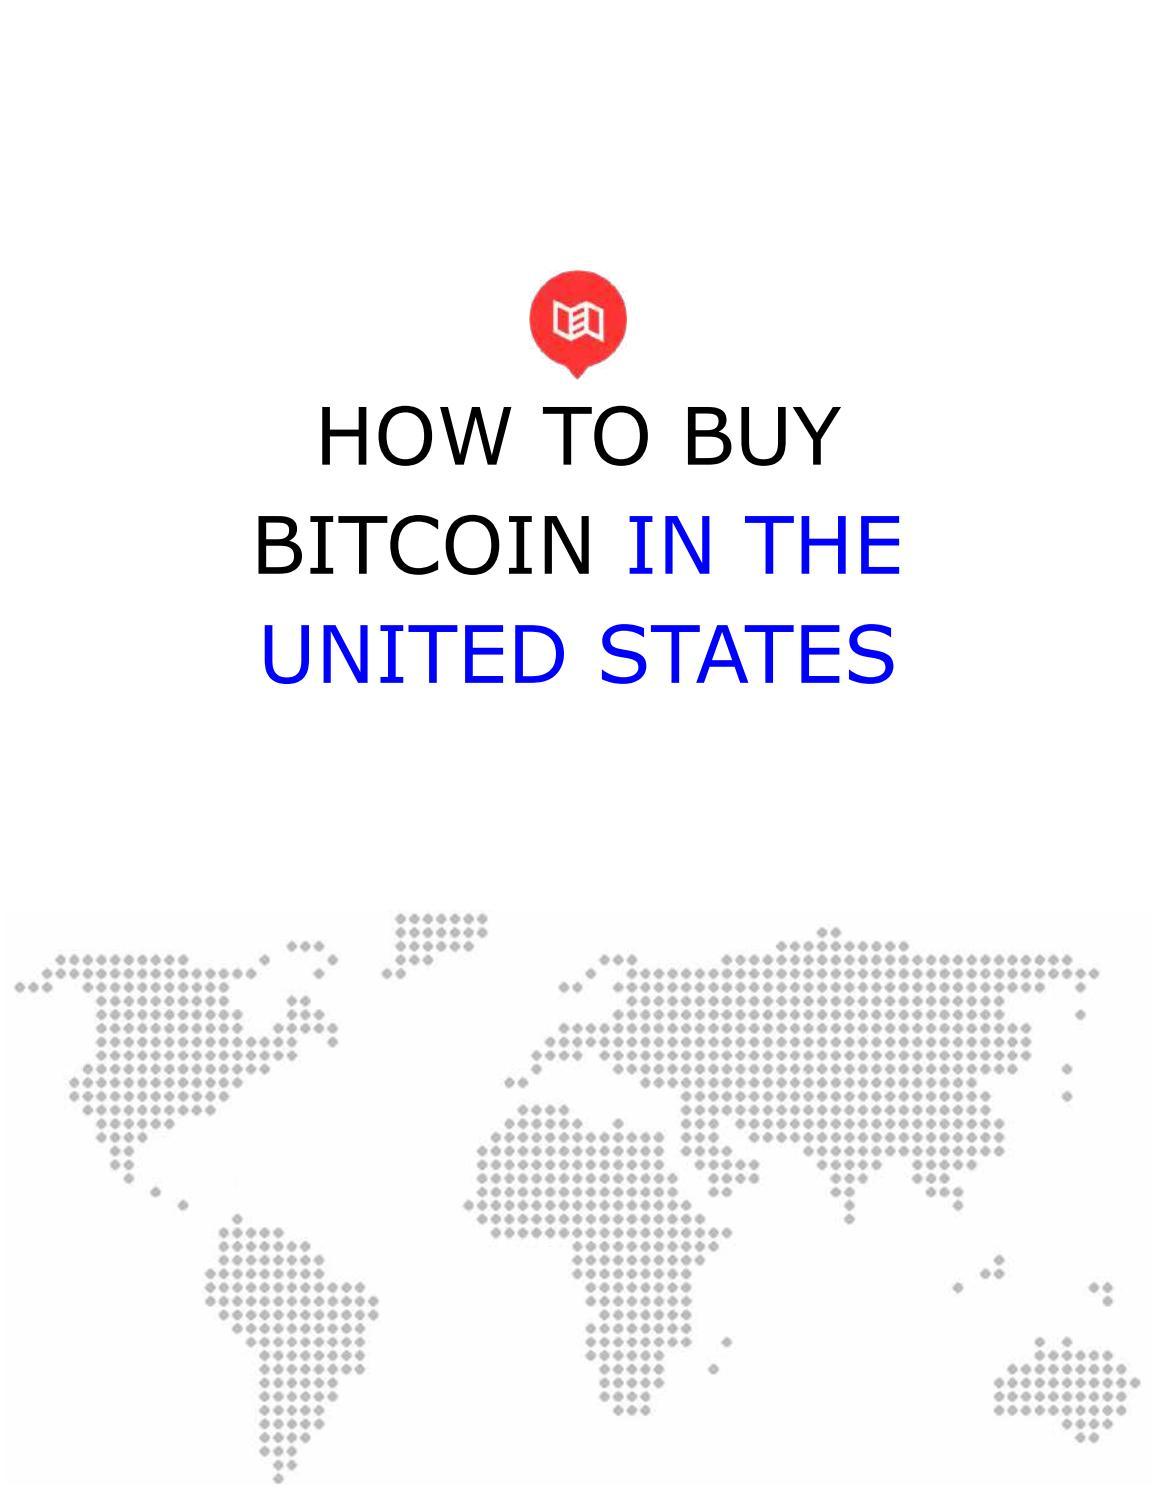 Brandon hayward getting bitcoins think 21 betting shops in bermuda